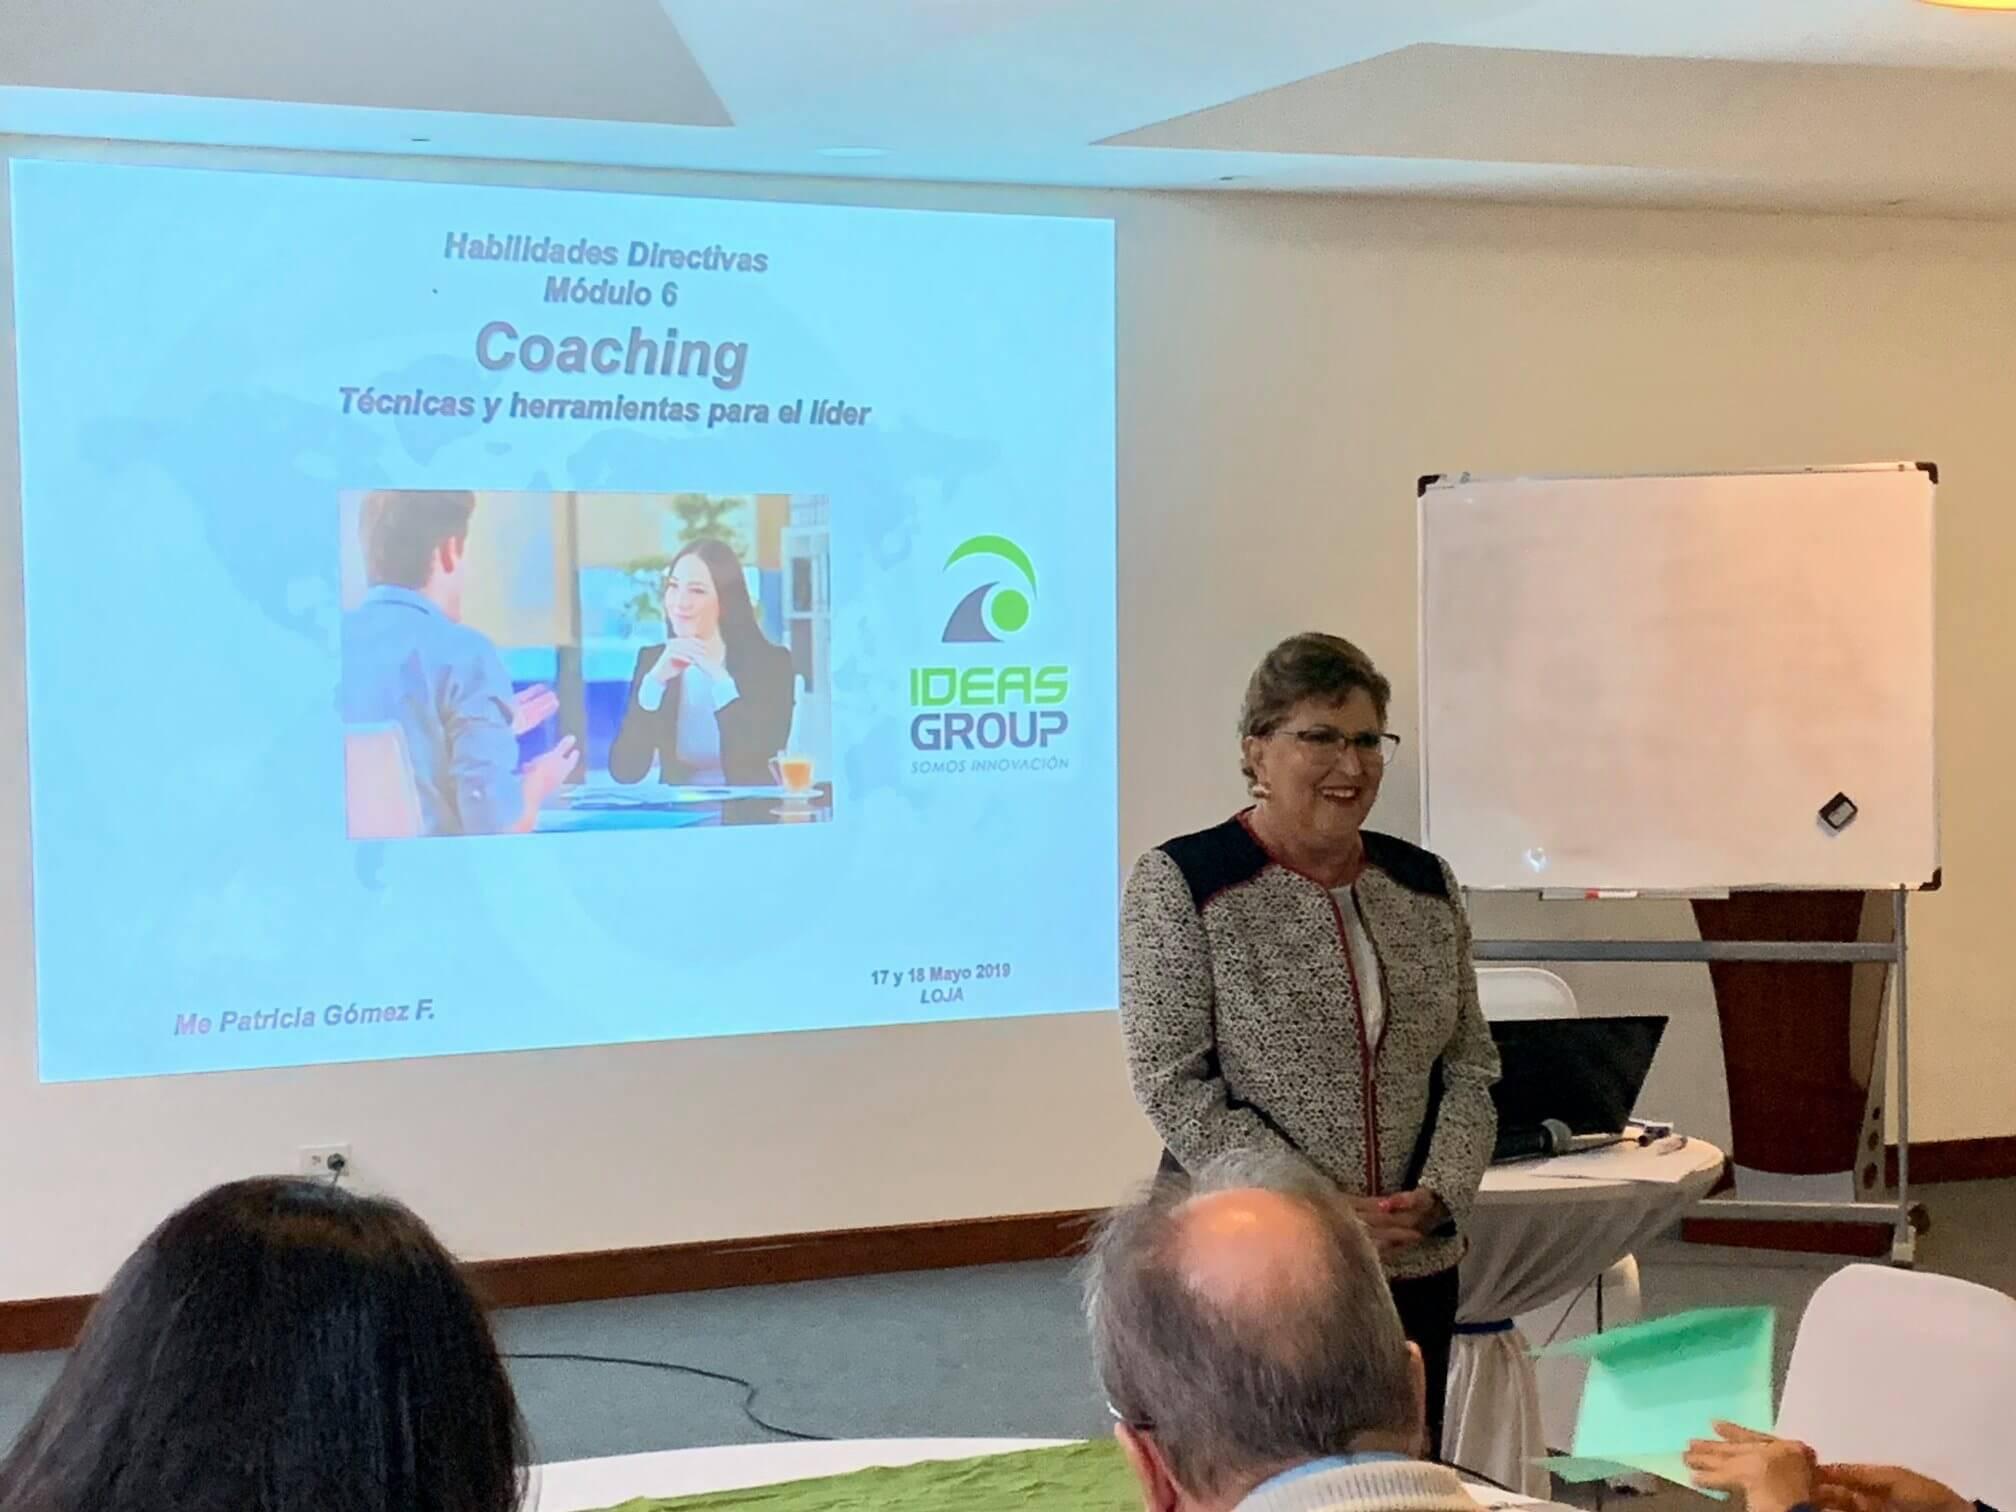 Programa Internacional de Desarrollo de Gerencial - Fundación FACES - Loja, Ecuador - Capacitación empresarial por IDEASGROUP Ecuador